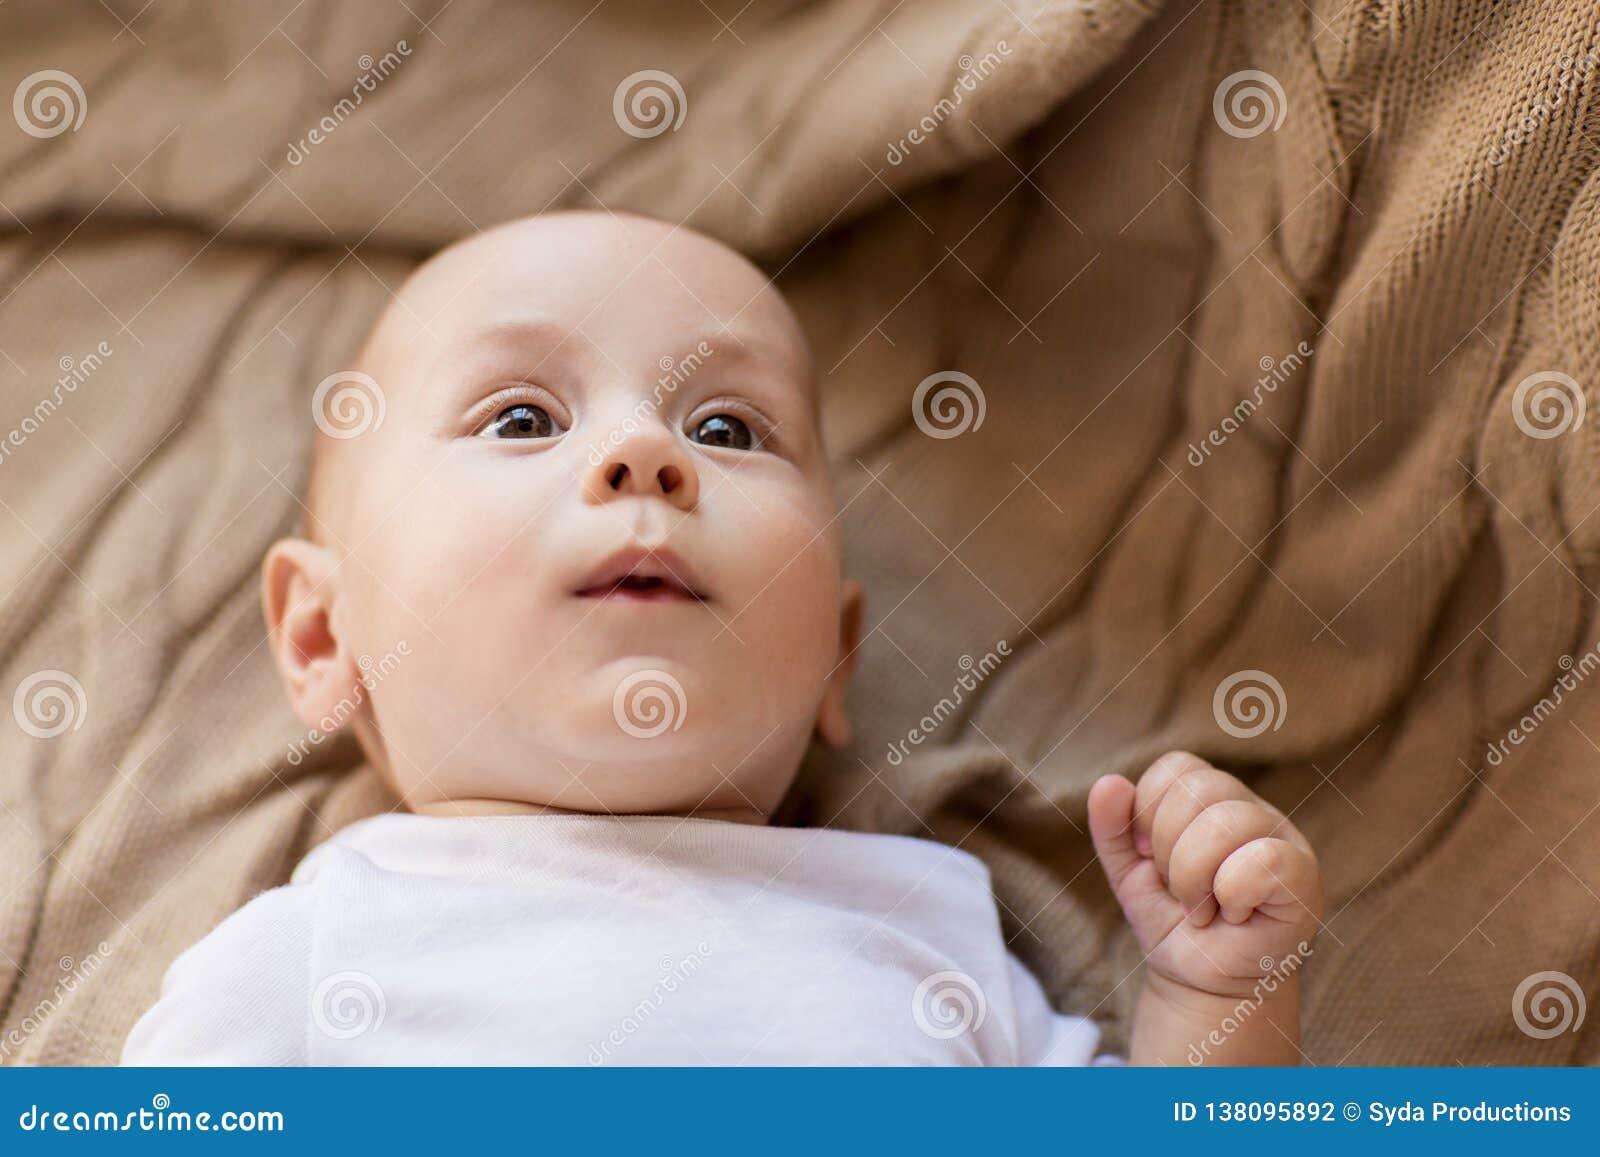 Sweet little baby boy lying on knitted blanket